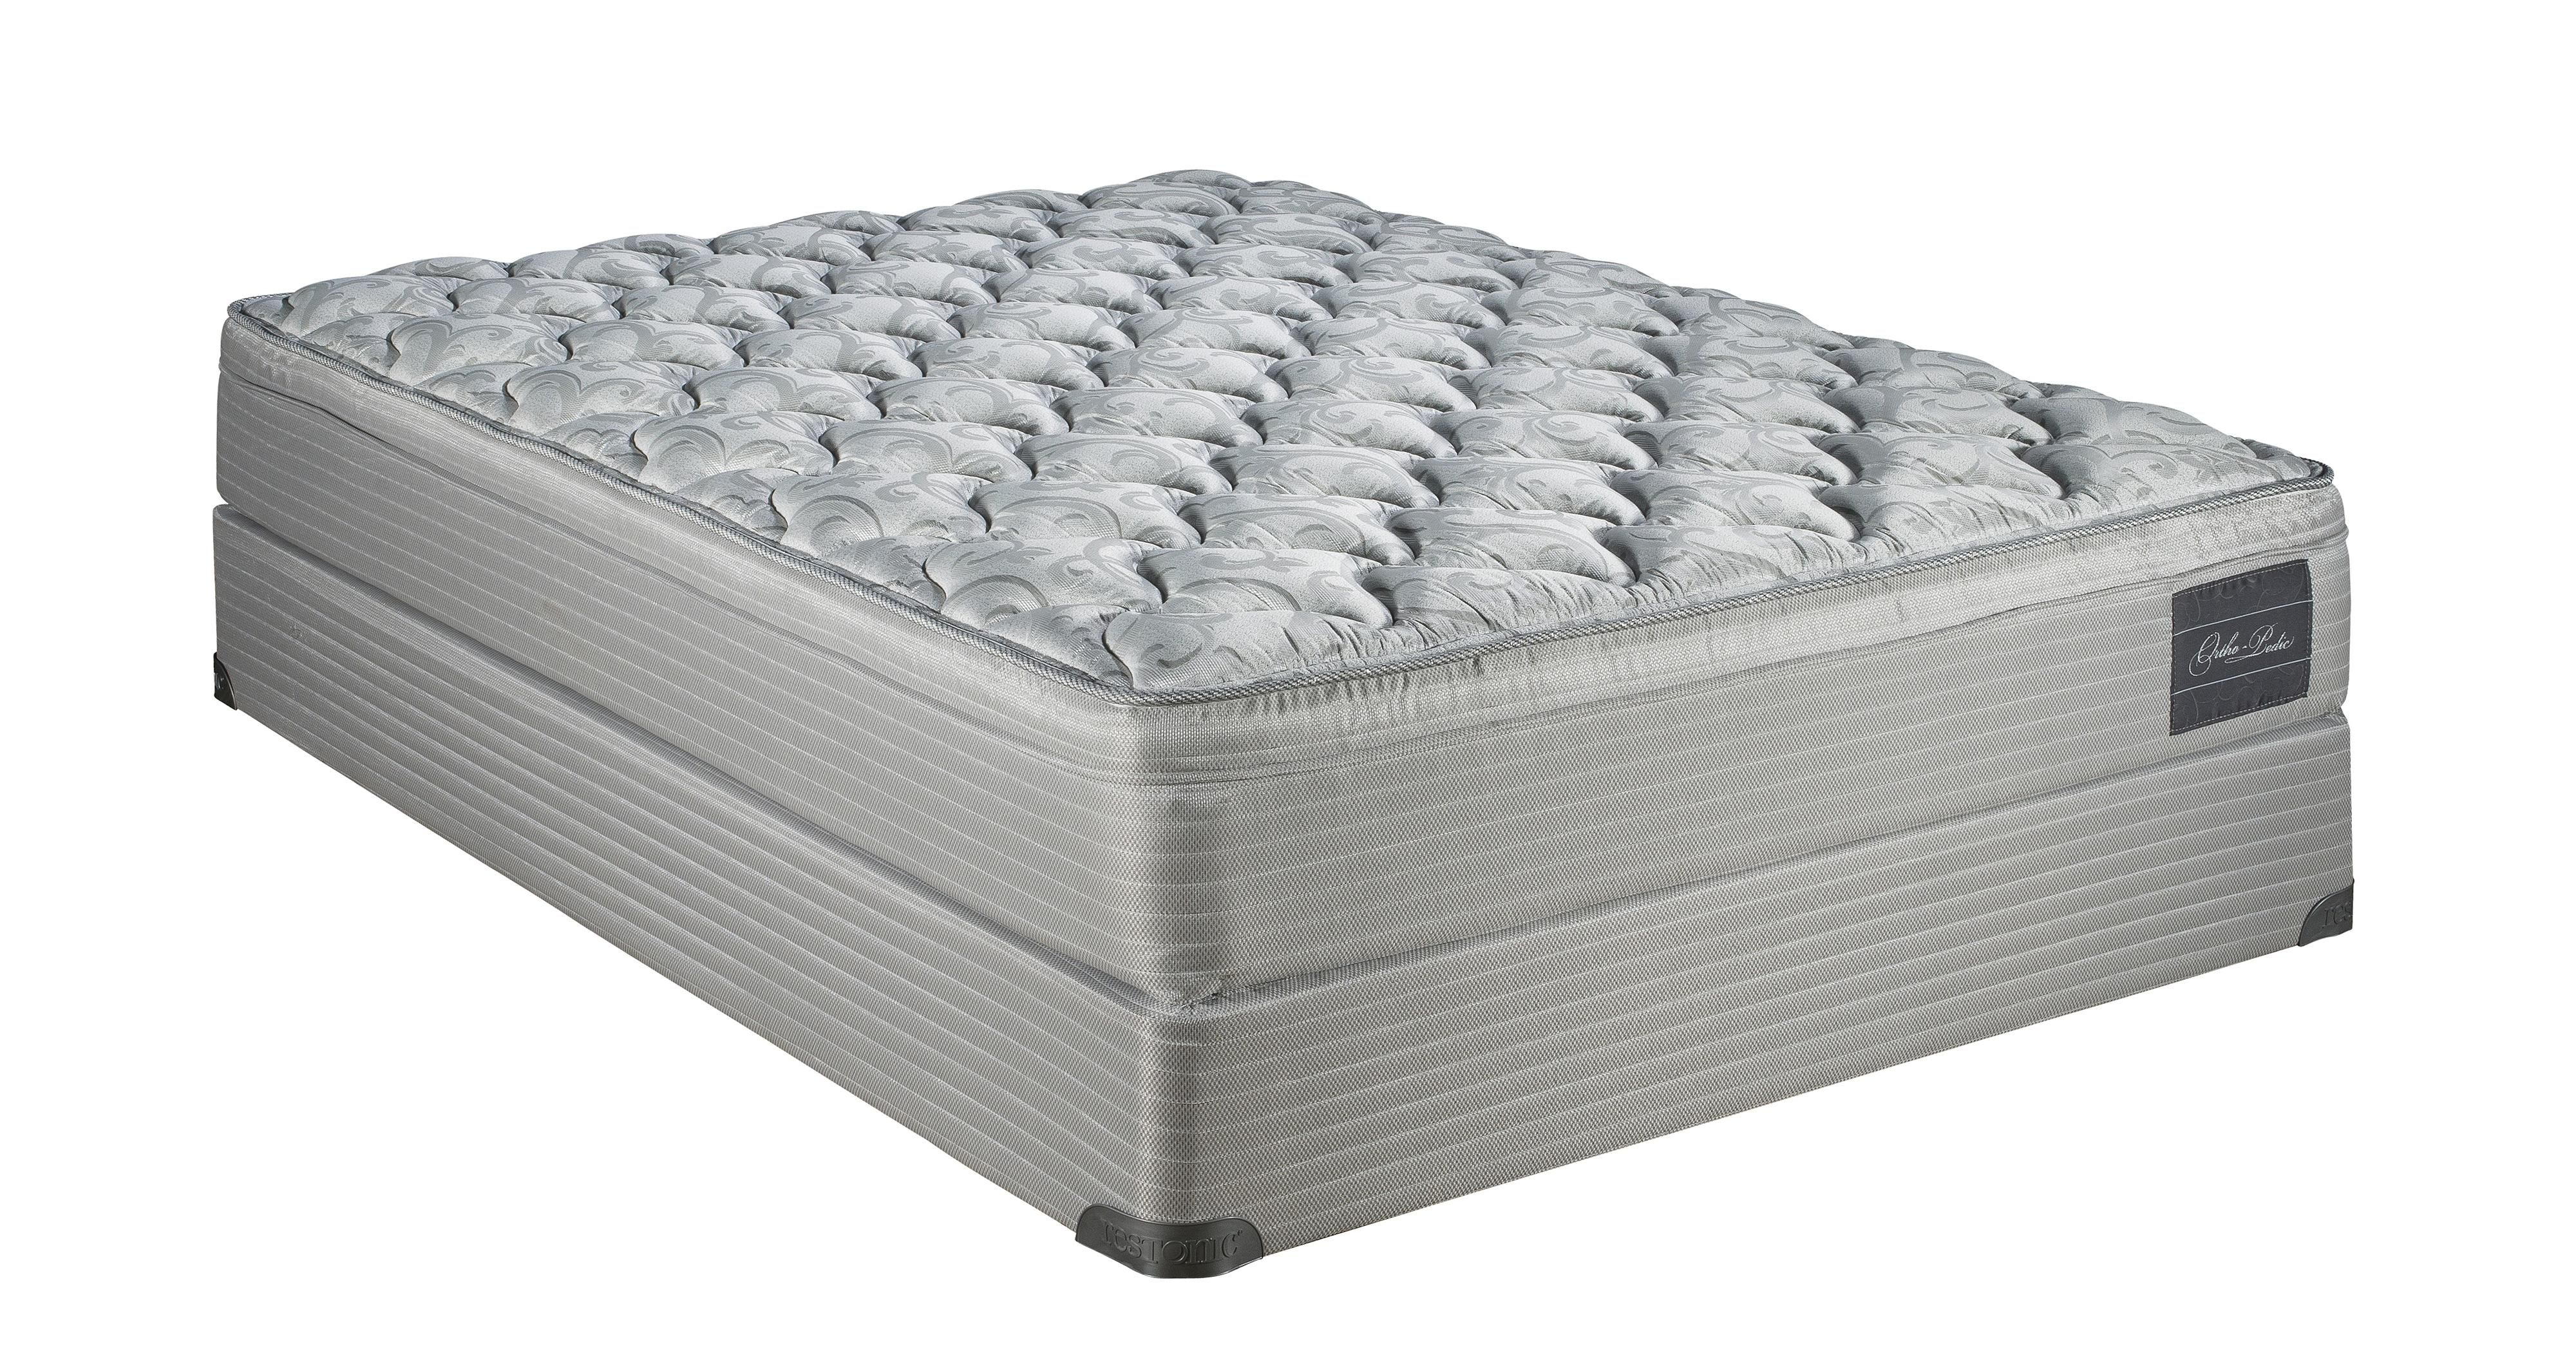 grace twin super plush pillow top mattress by restonic home decor